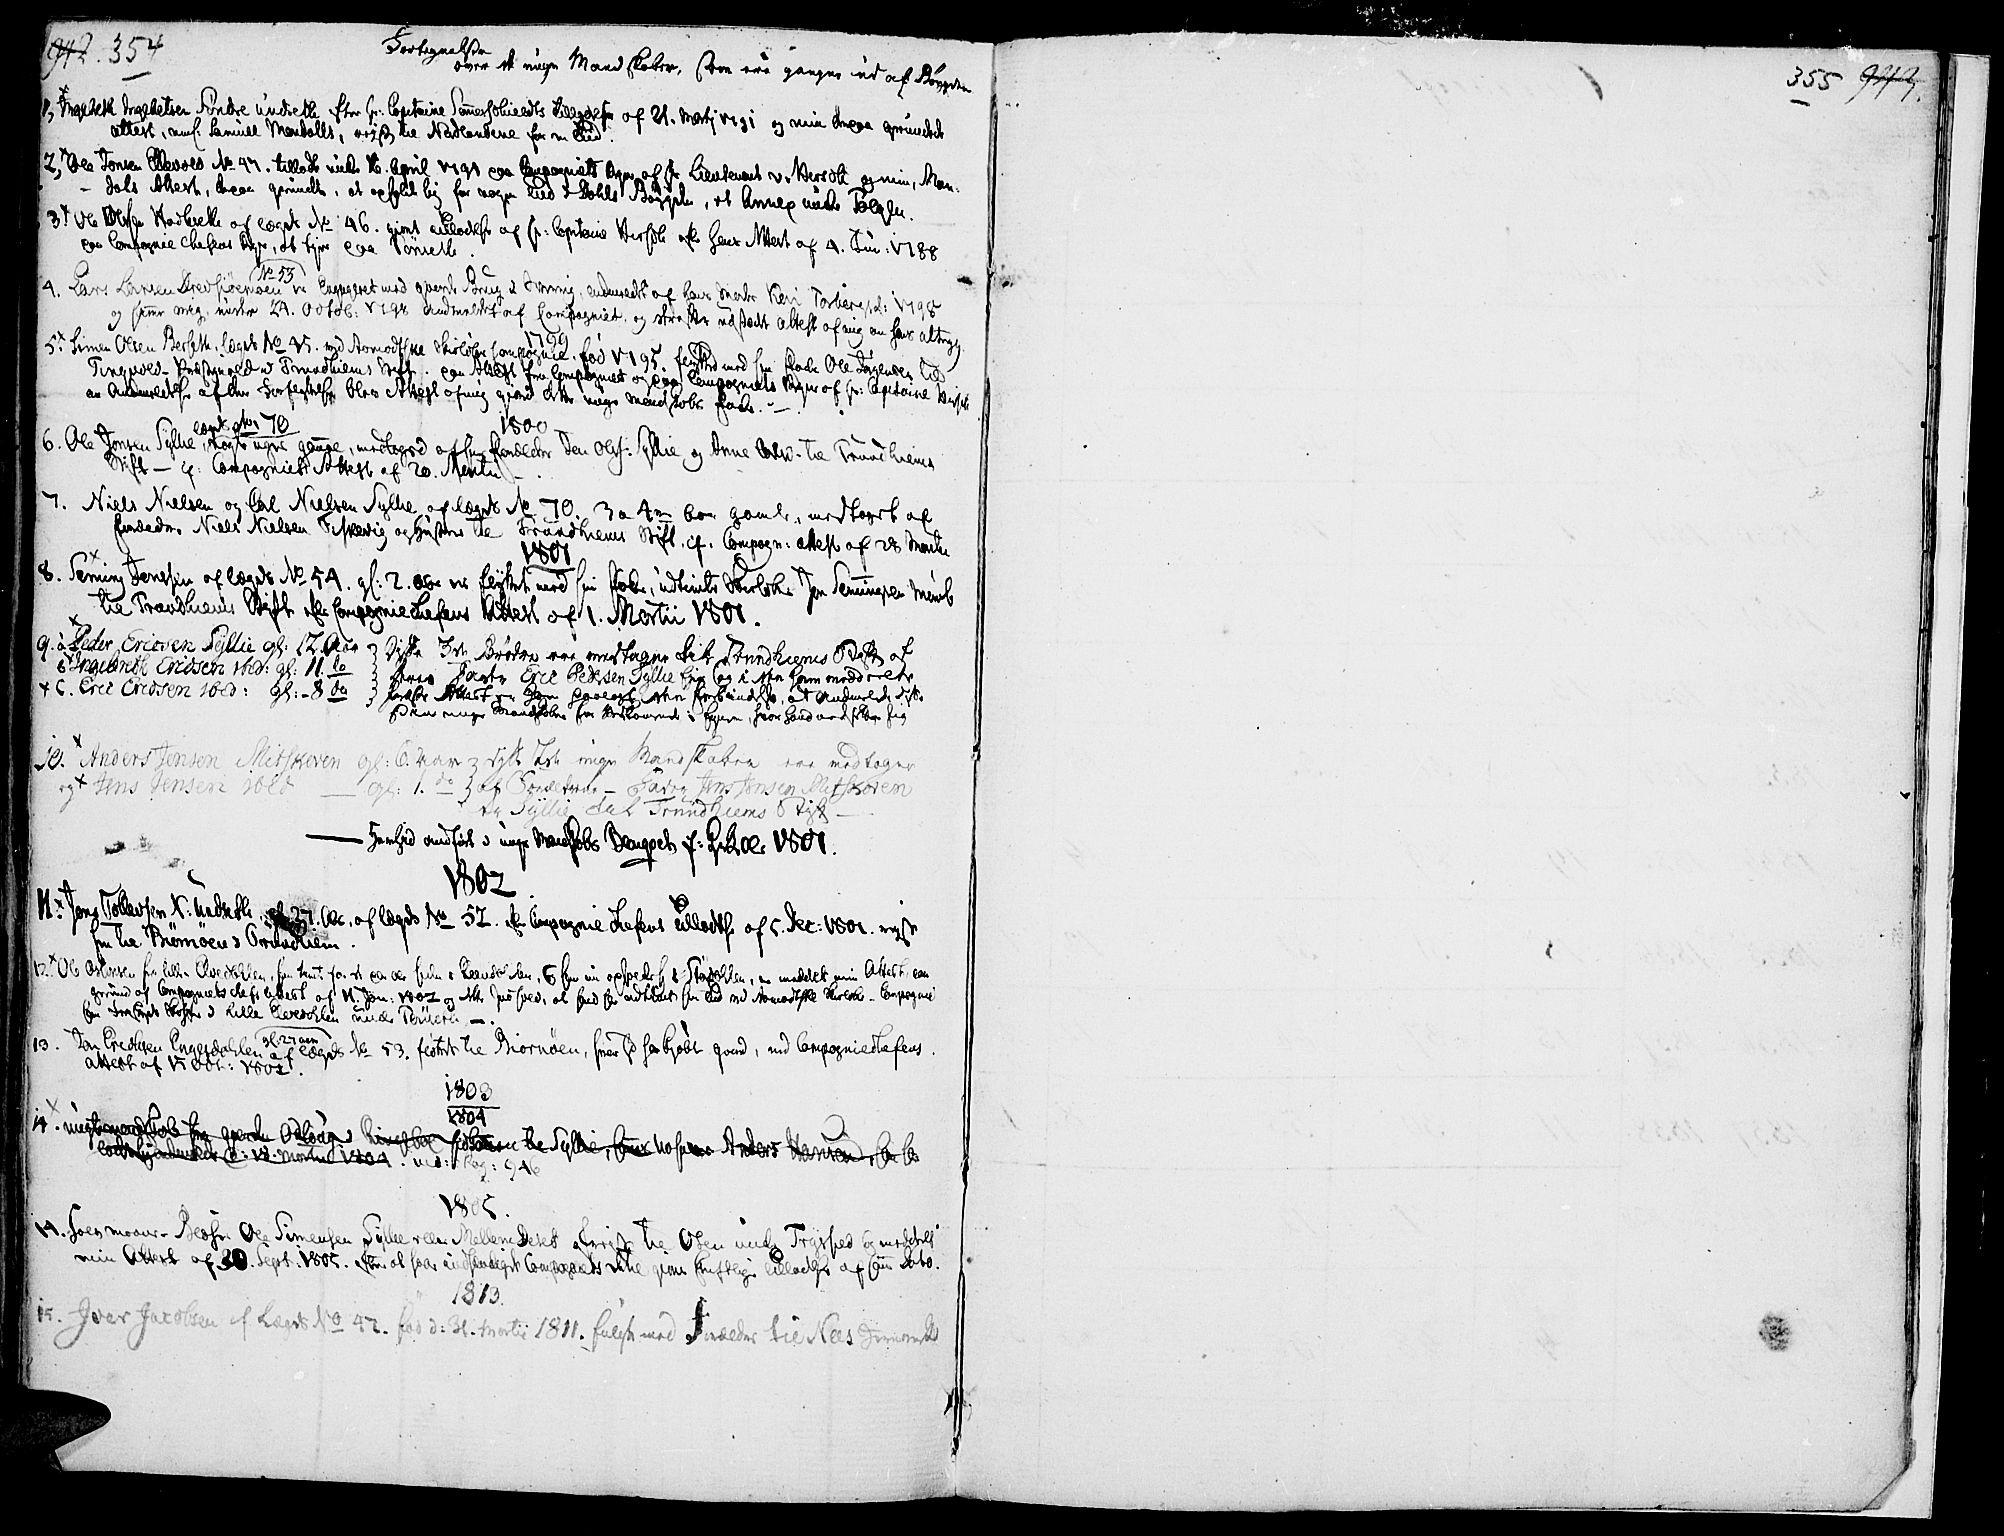 SAH, Rendalen prestekontor, H/Ha/Haa/L0002: Ministerialbok nr. 2, 1788-1814, s. 354-355